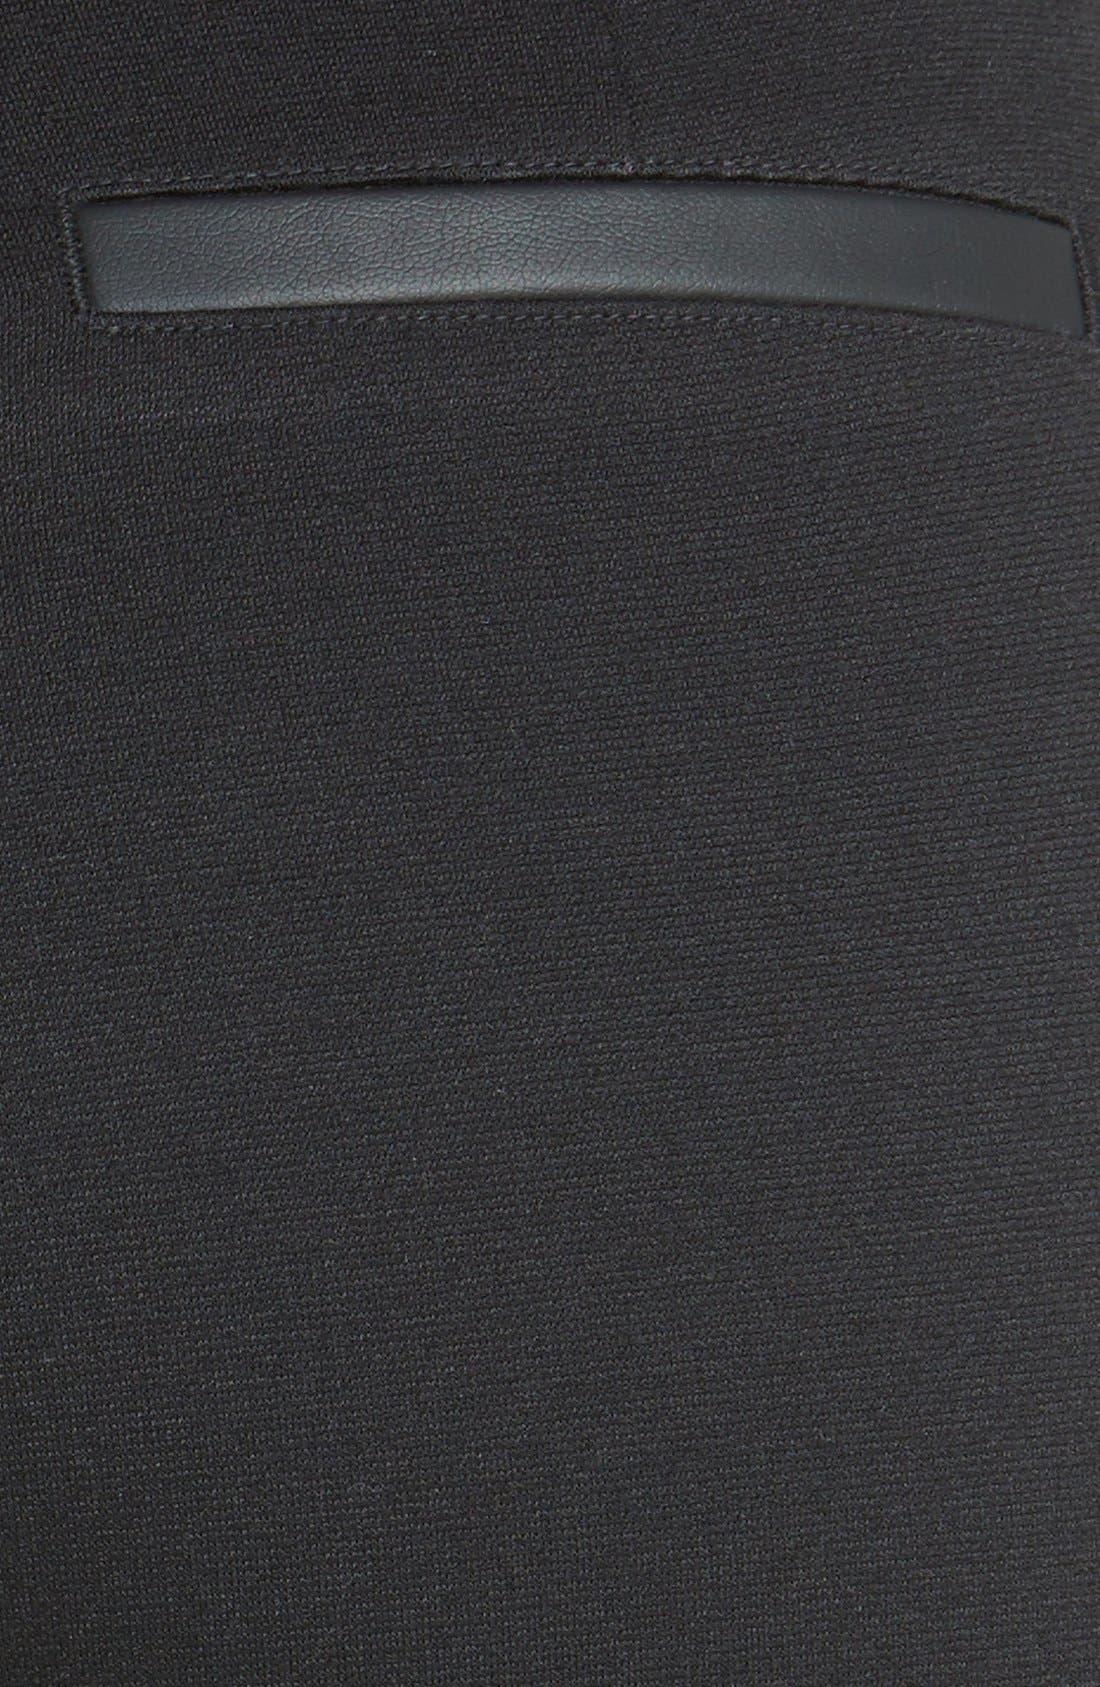 Alternate Image 4  - Halogen® Faux Leather Trim Skinny Ankle Pants (Regular & Petite)